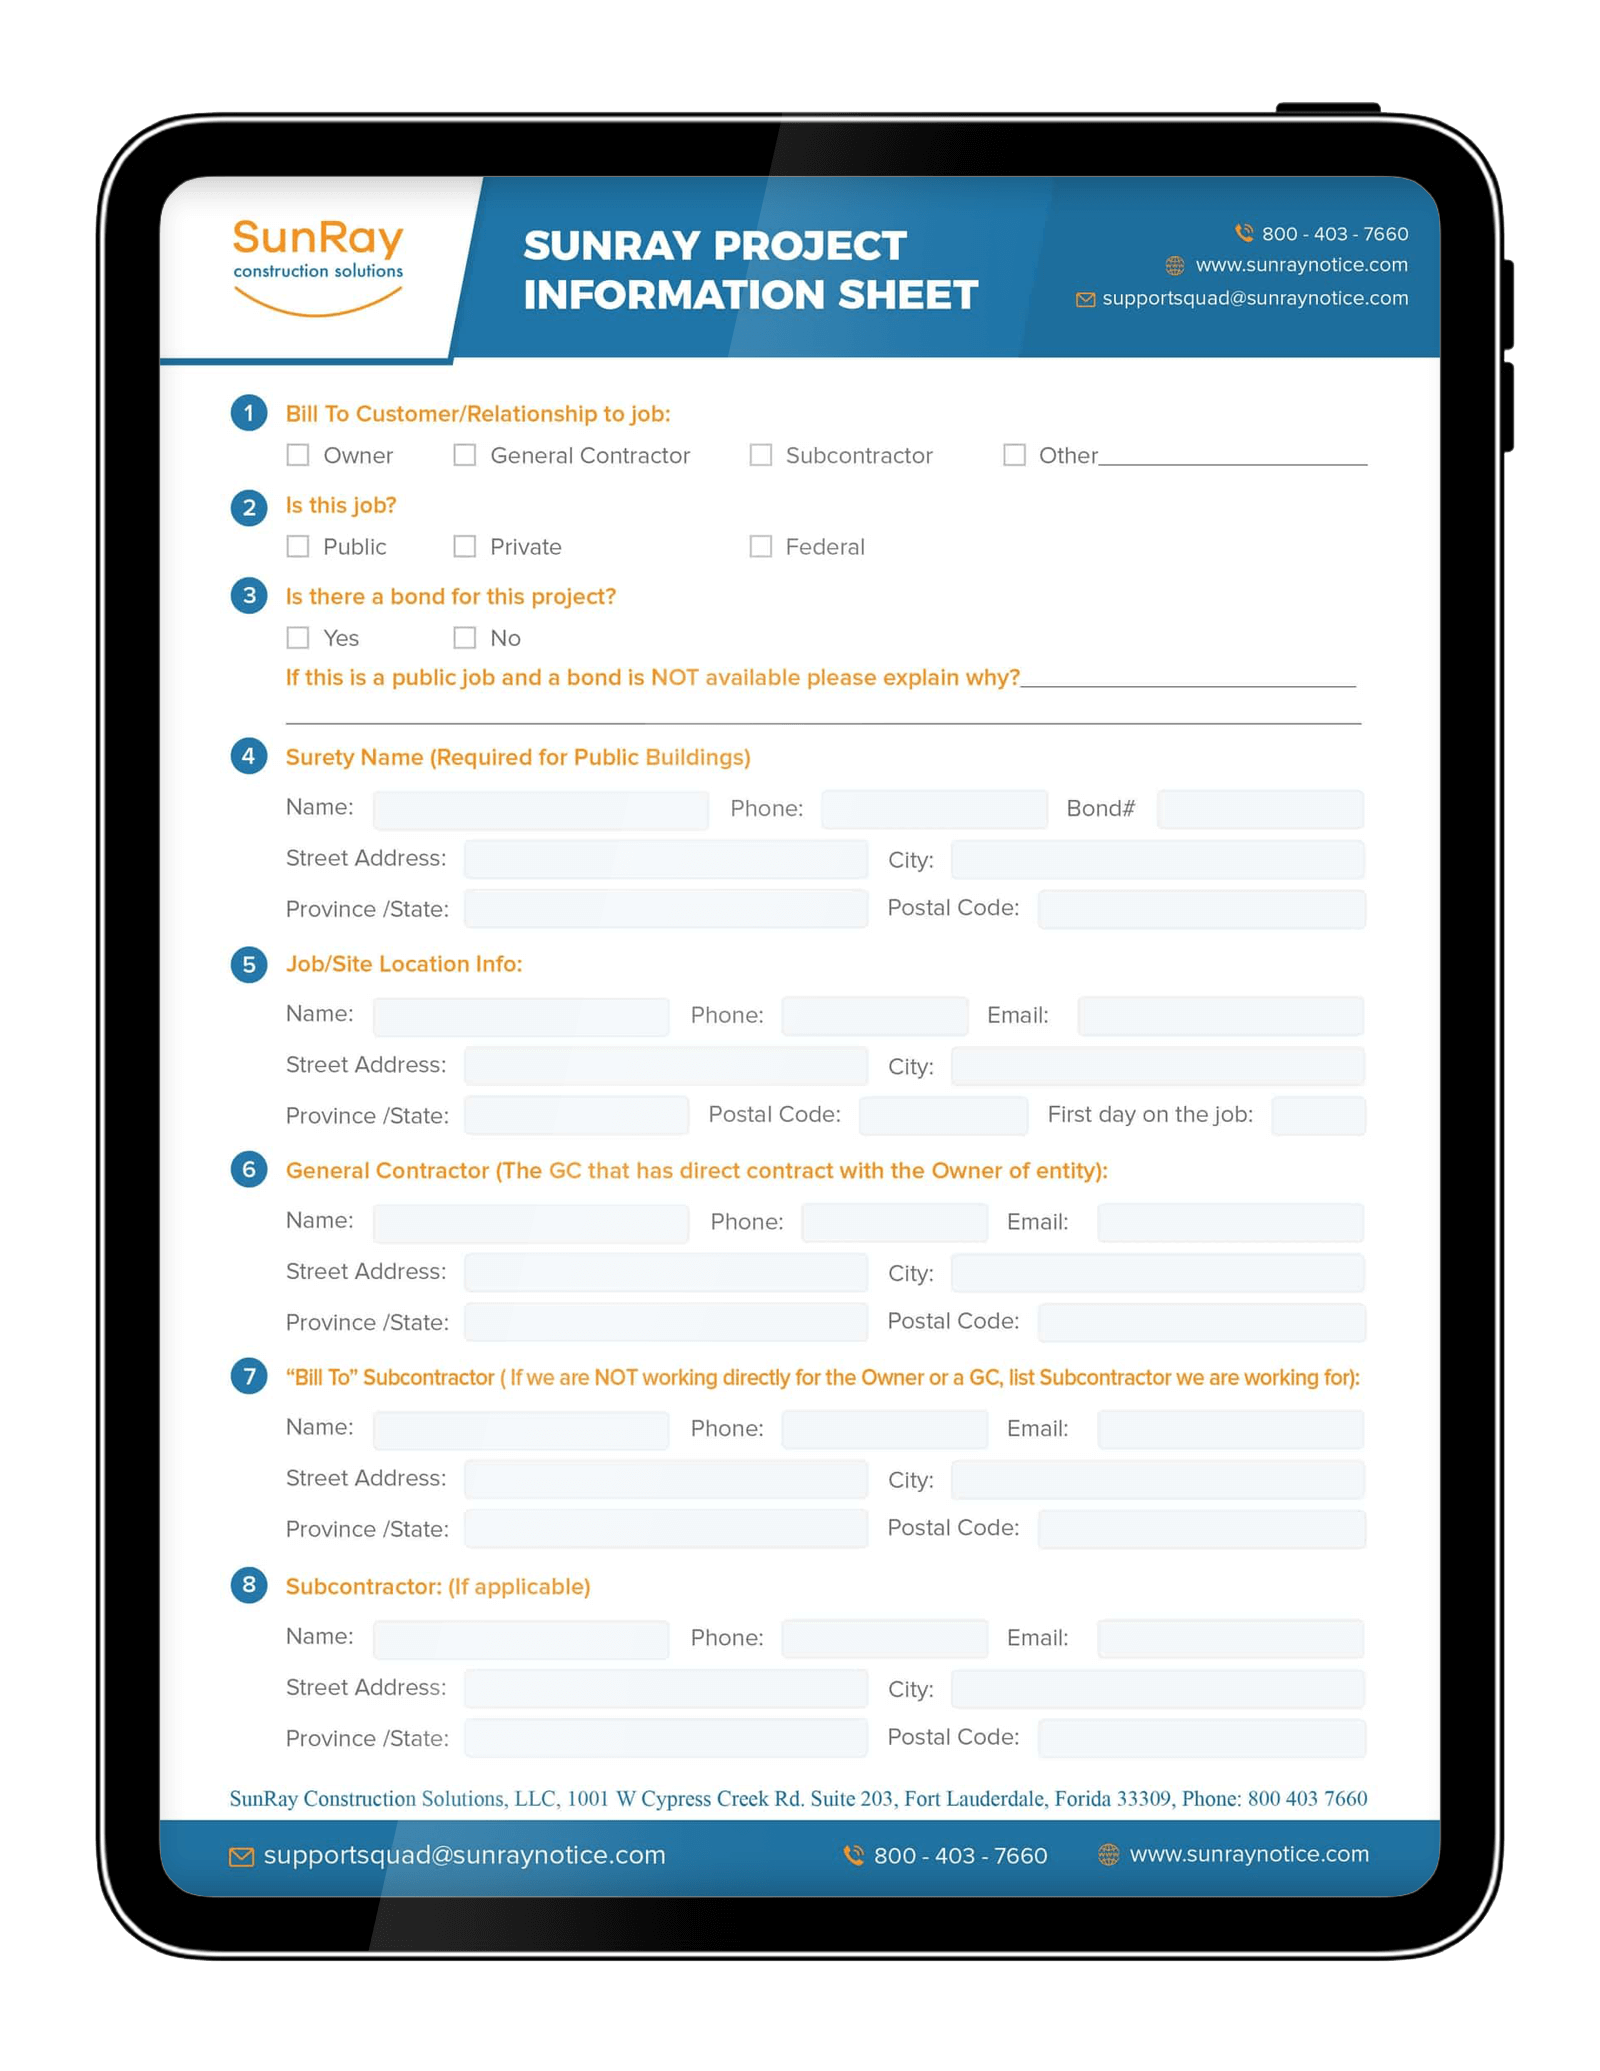 SunRay Project Information Sheet